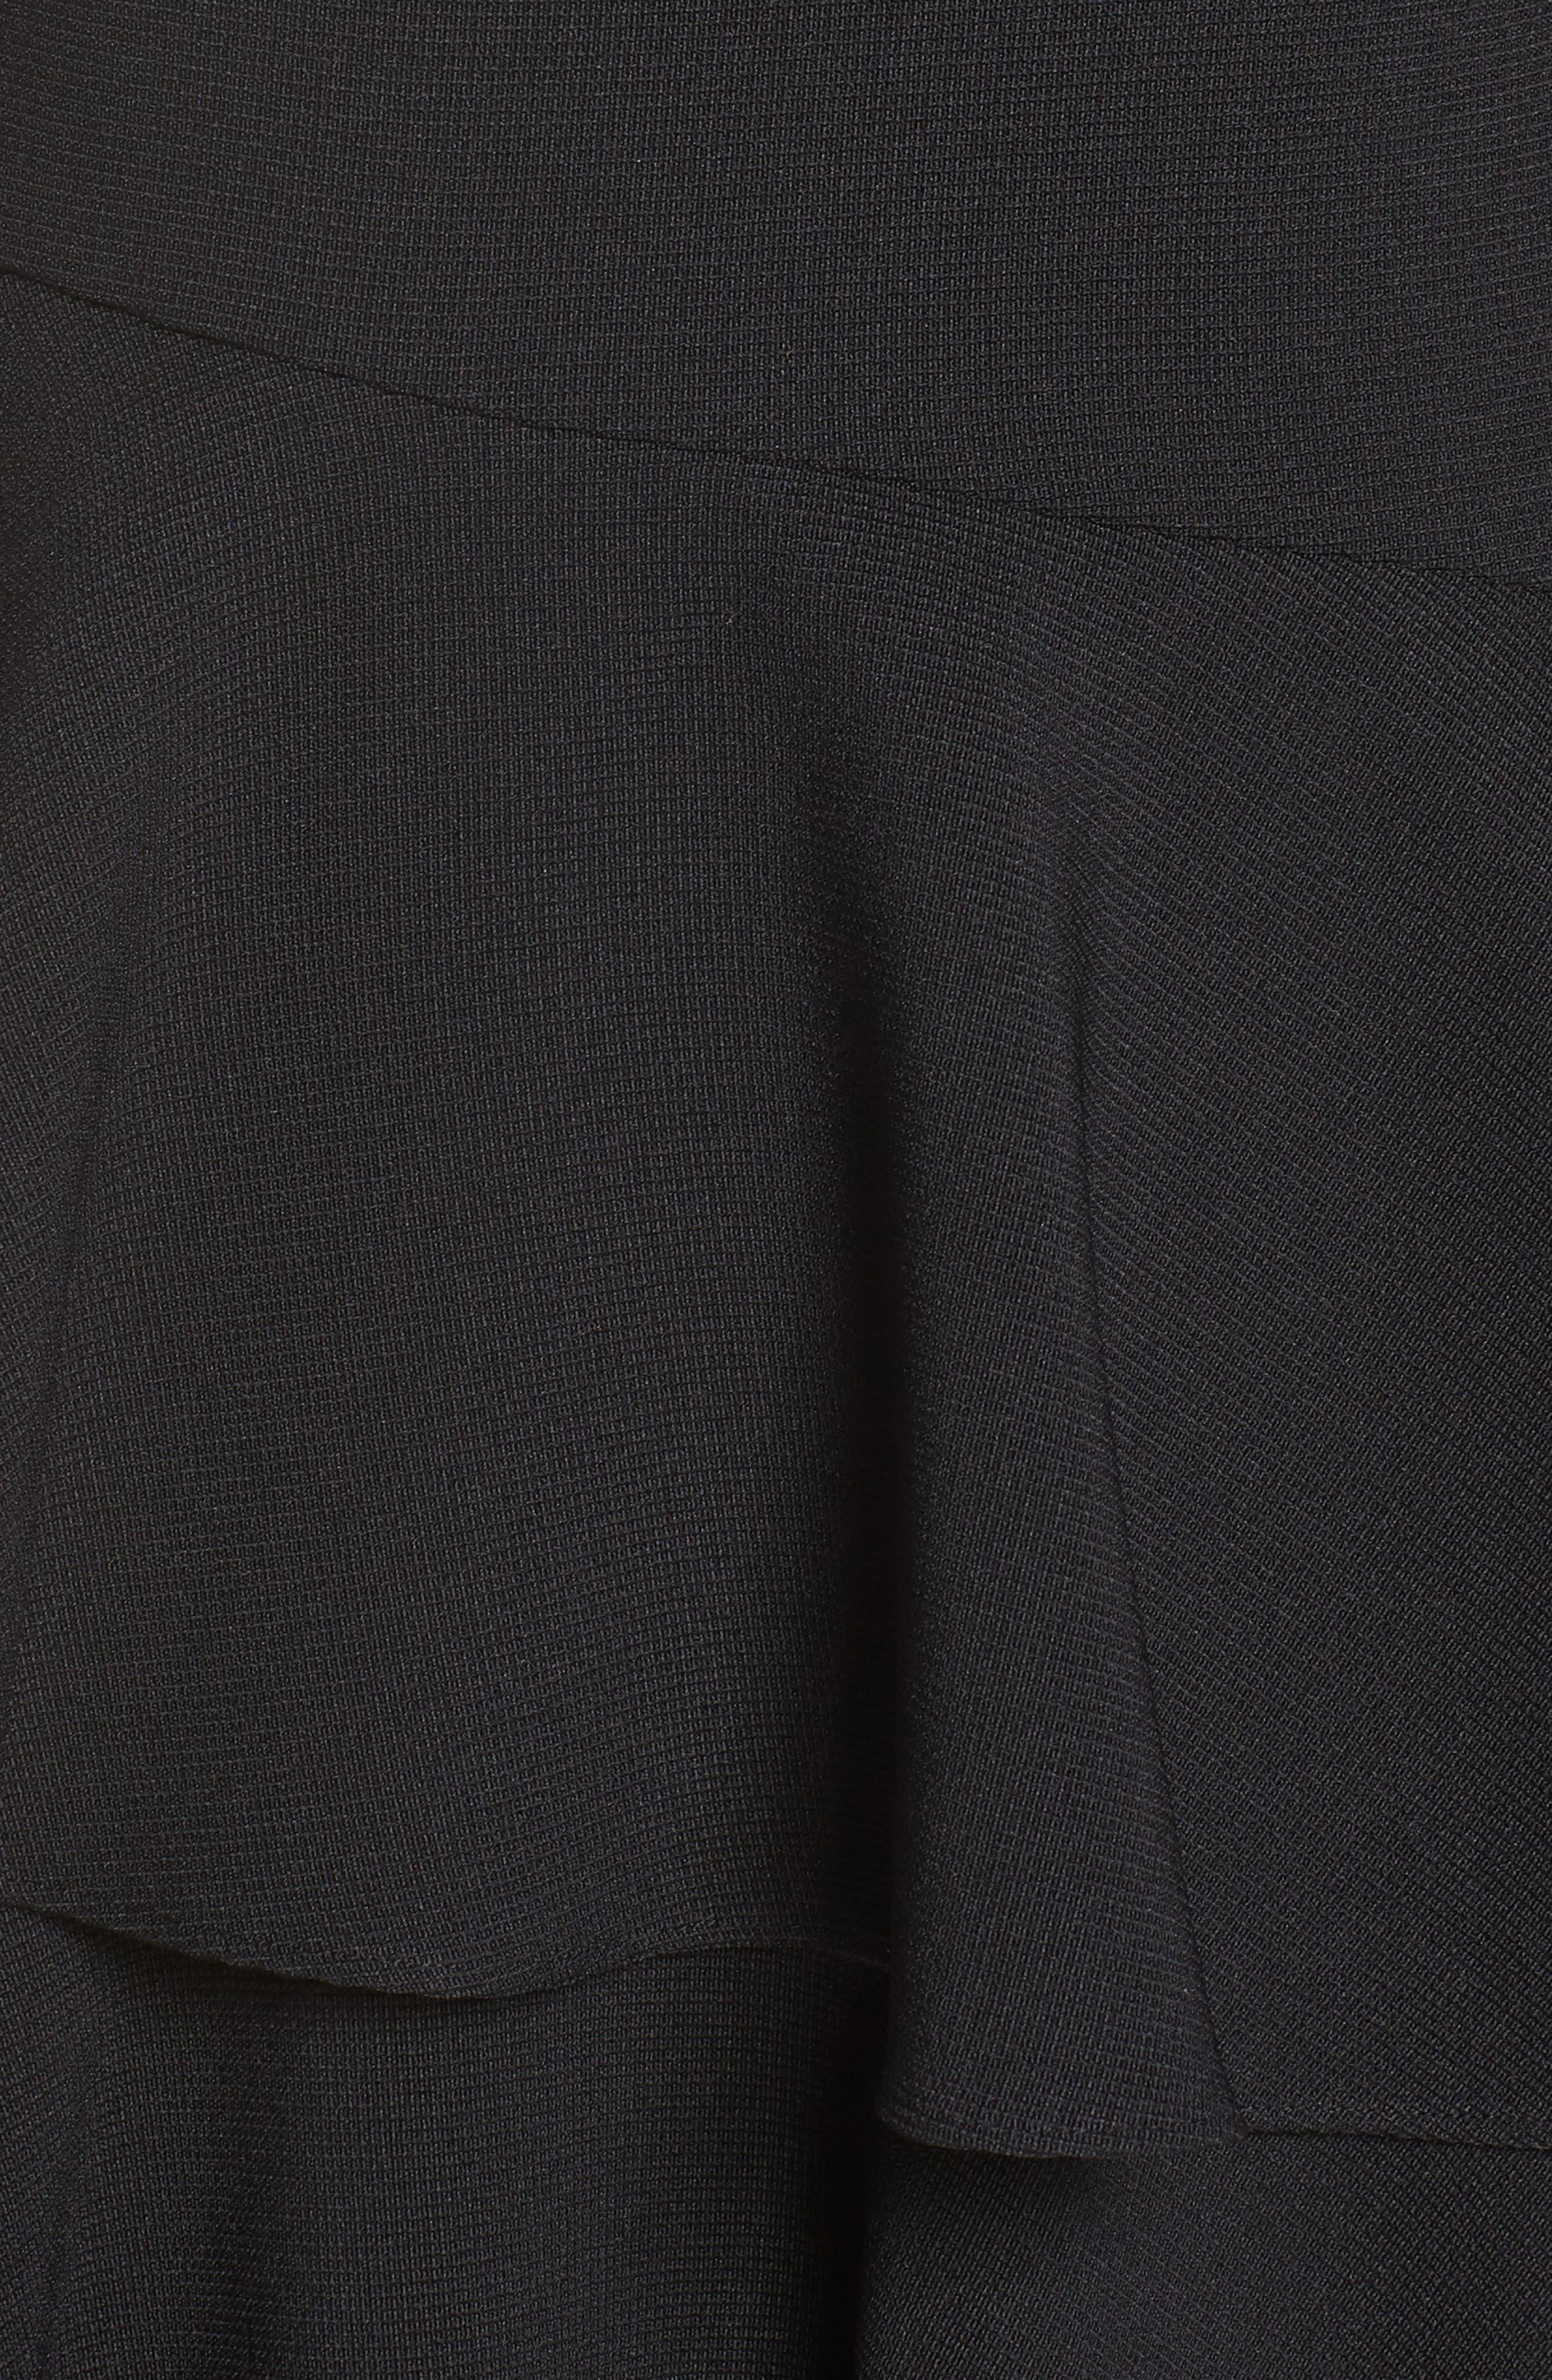 Tiered Ruffle Knit Dress,                             Alternate thumbnail 6, color,                             BLACK